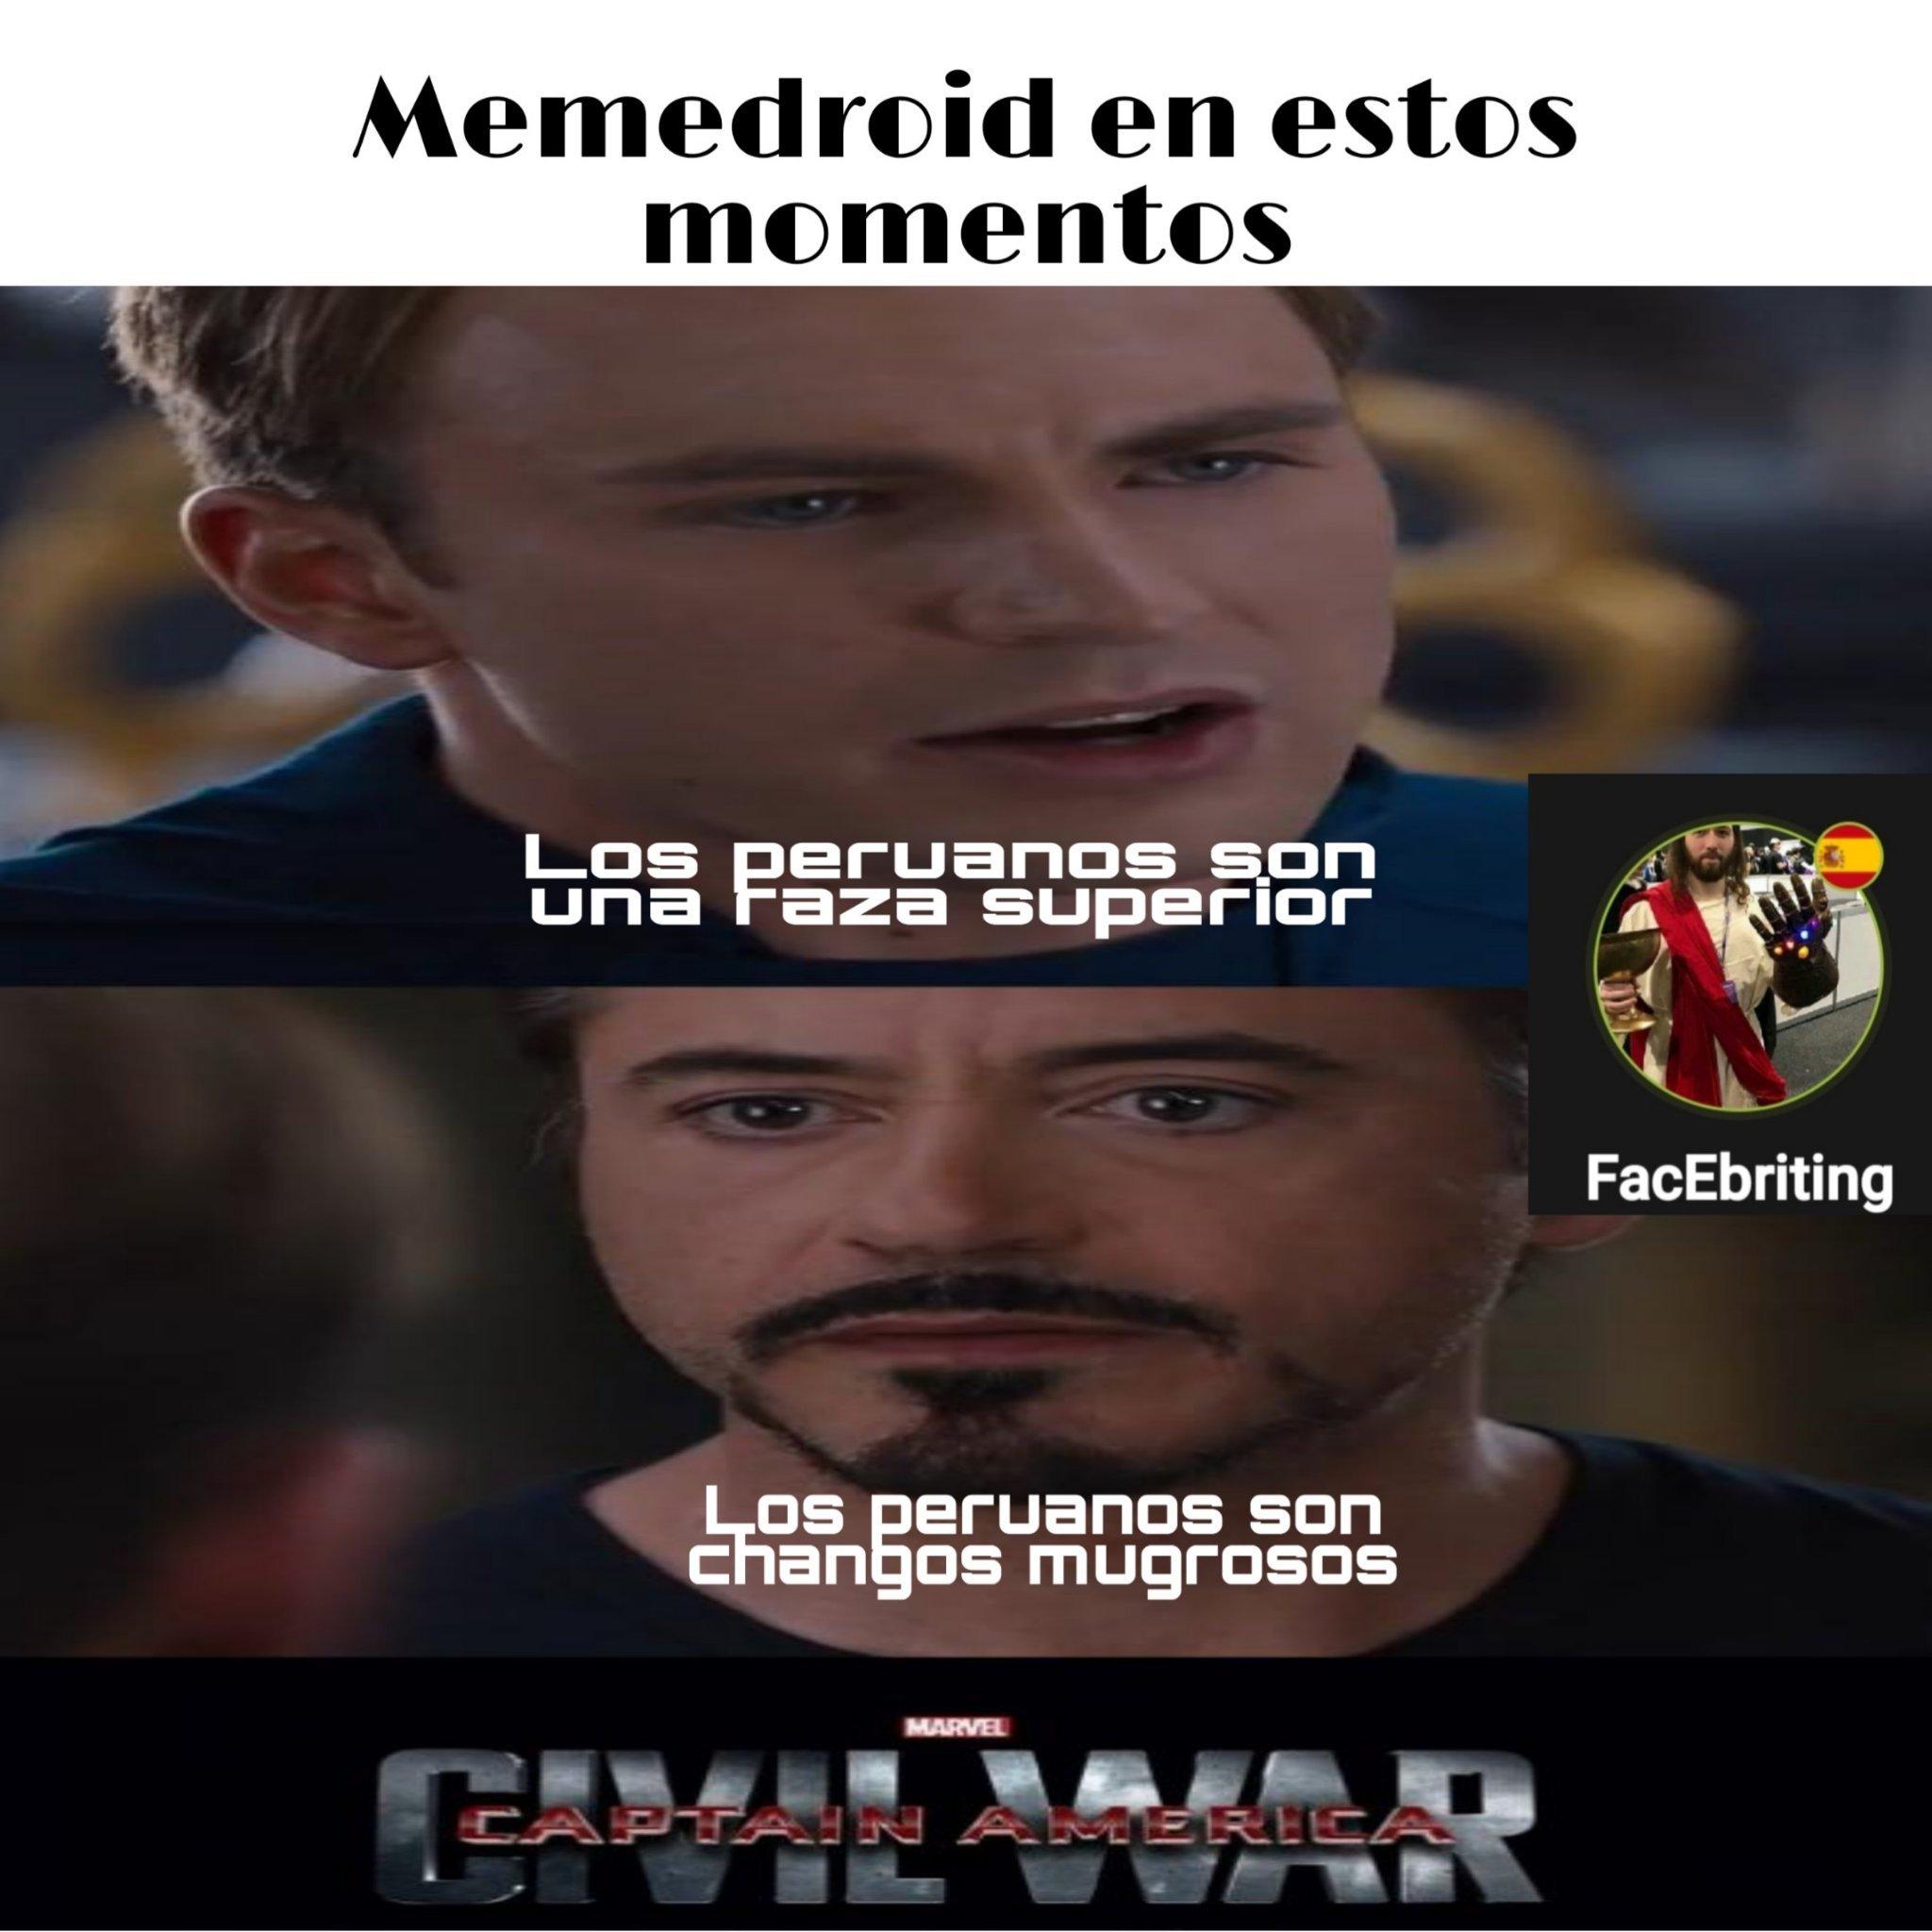 Peruanos son una raza superior - meme